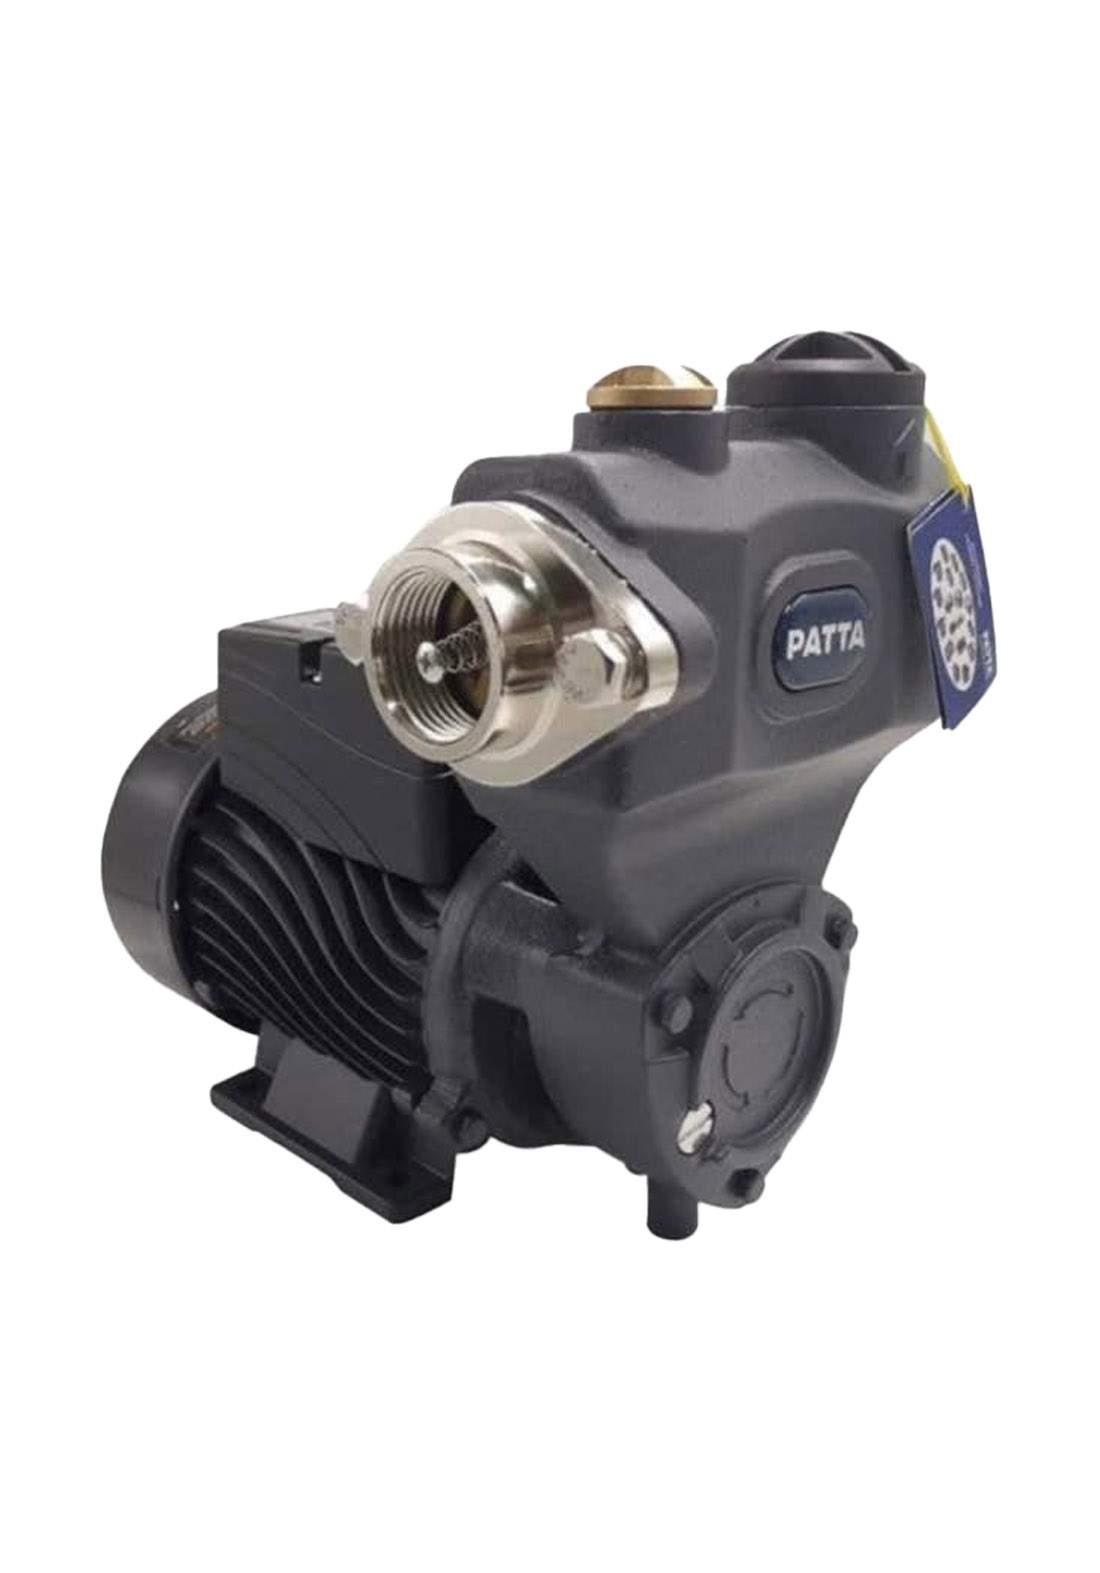 Patta PATWZB-35 Domestic Water Pump  550 W ماطور مياه